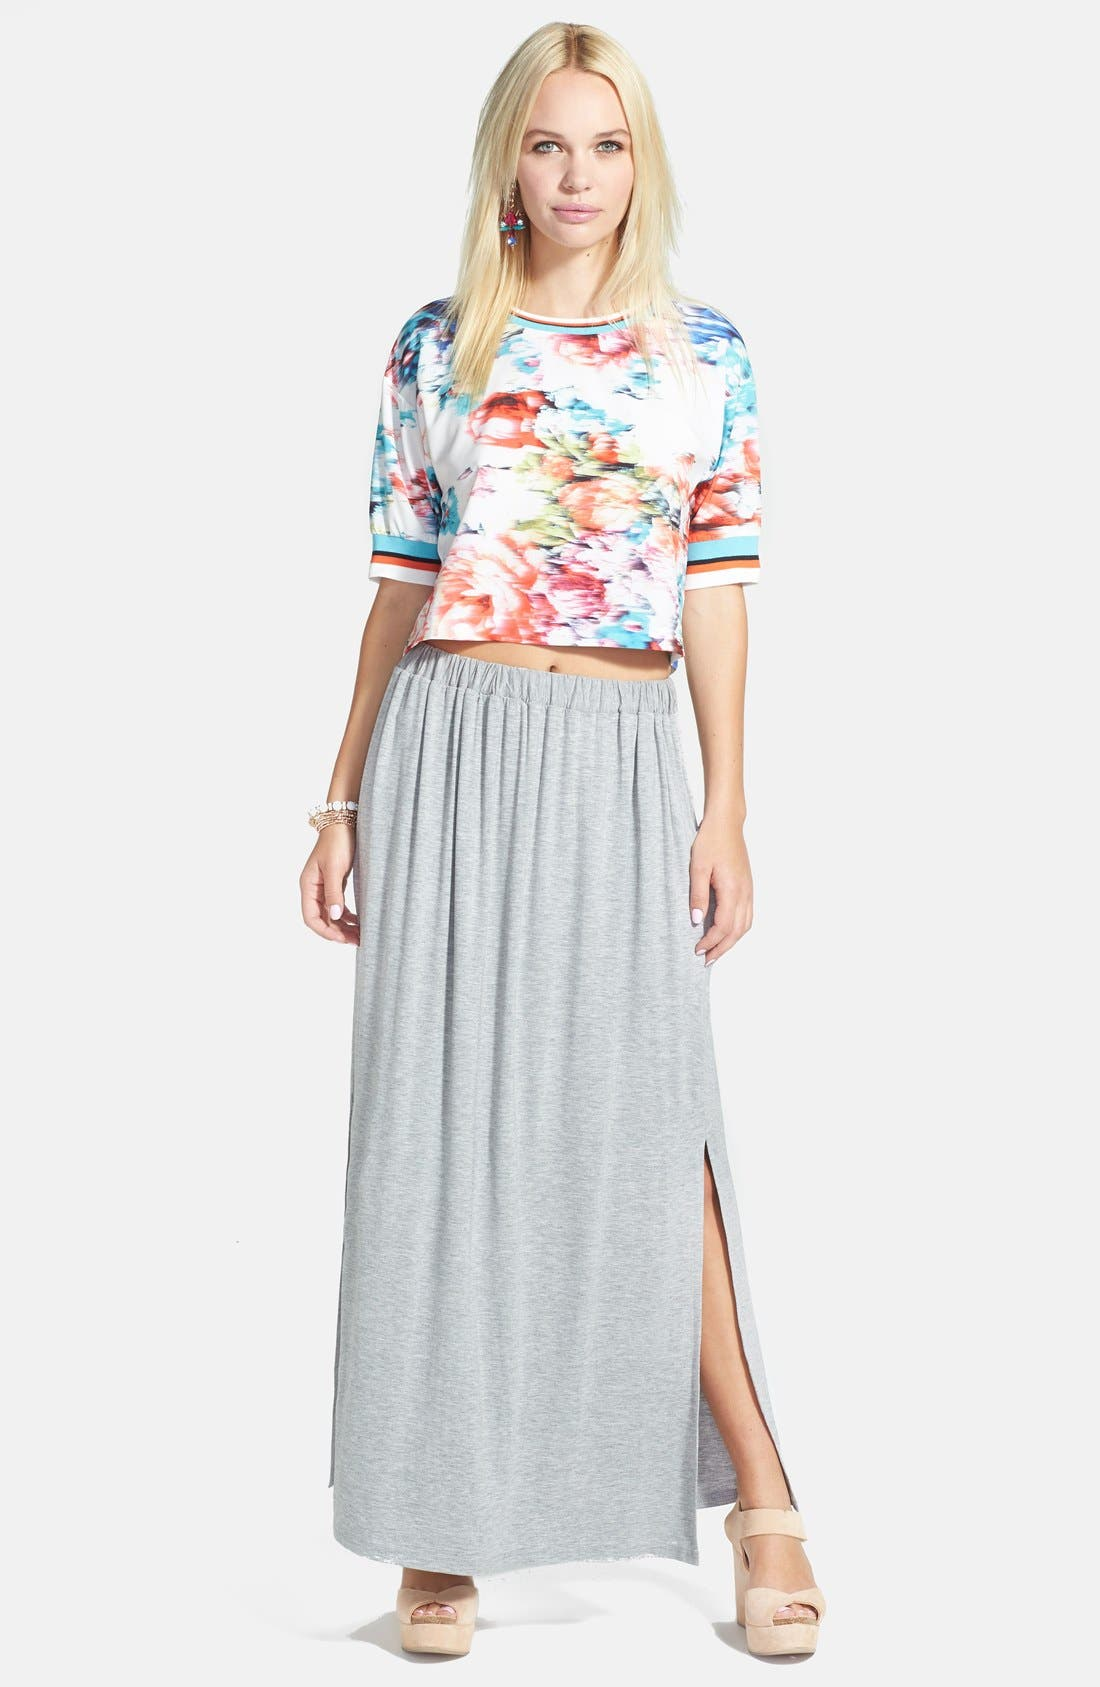 Alternate Image 1 Selected - re:named Floral Print Stripe Trim Tee